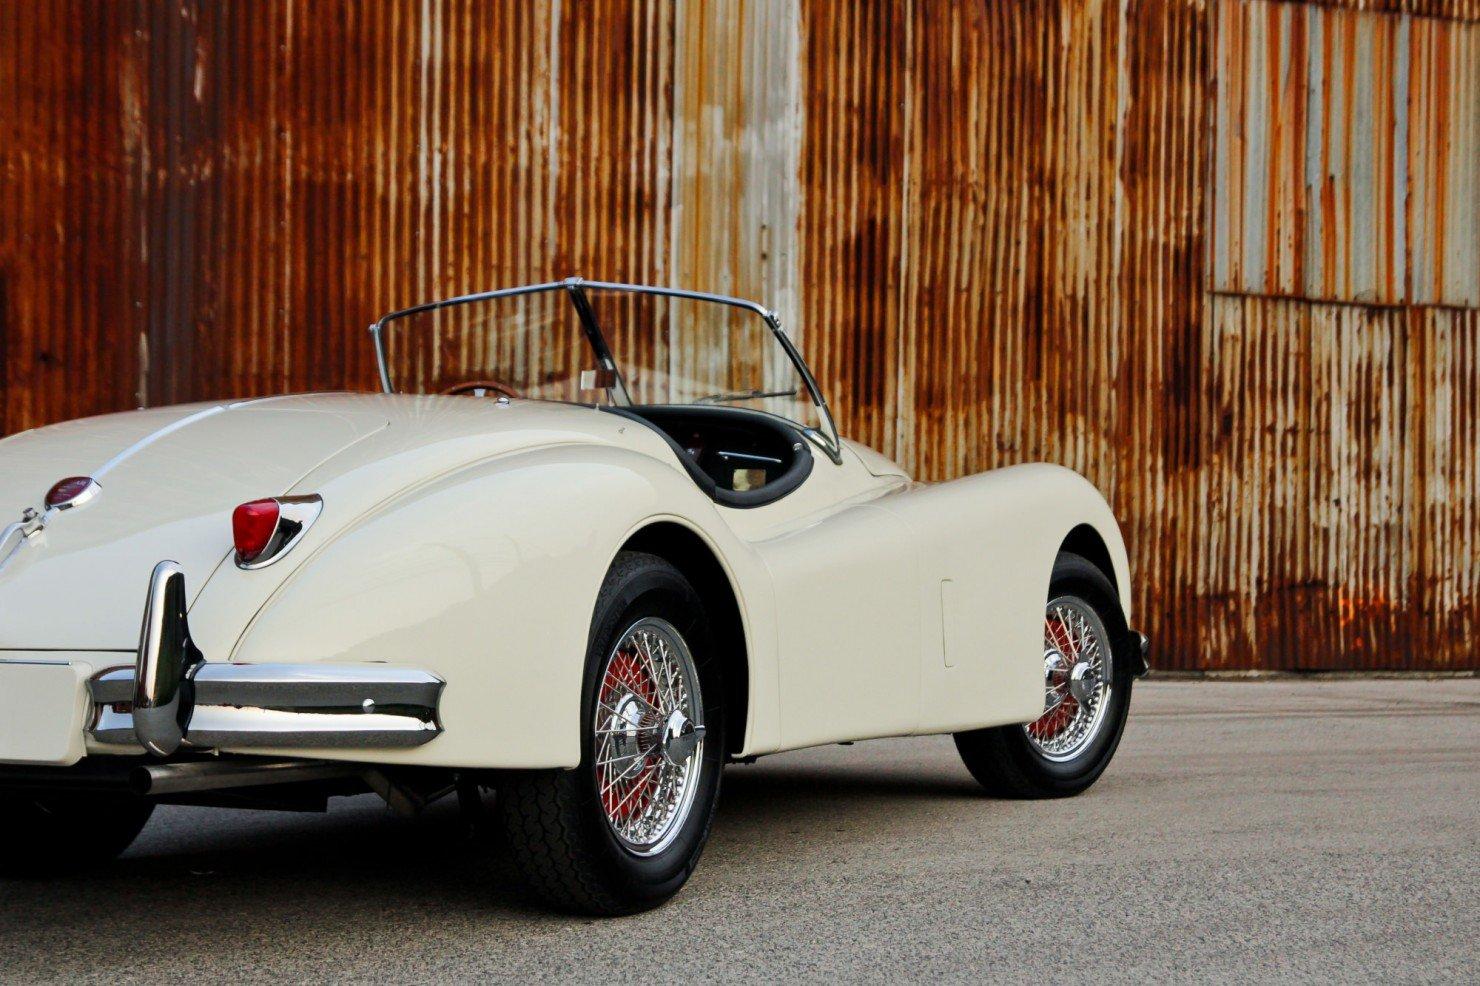 Jaguar_XK140_Car_8